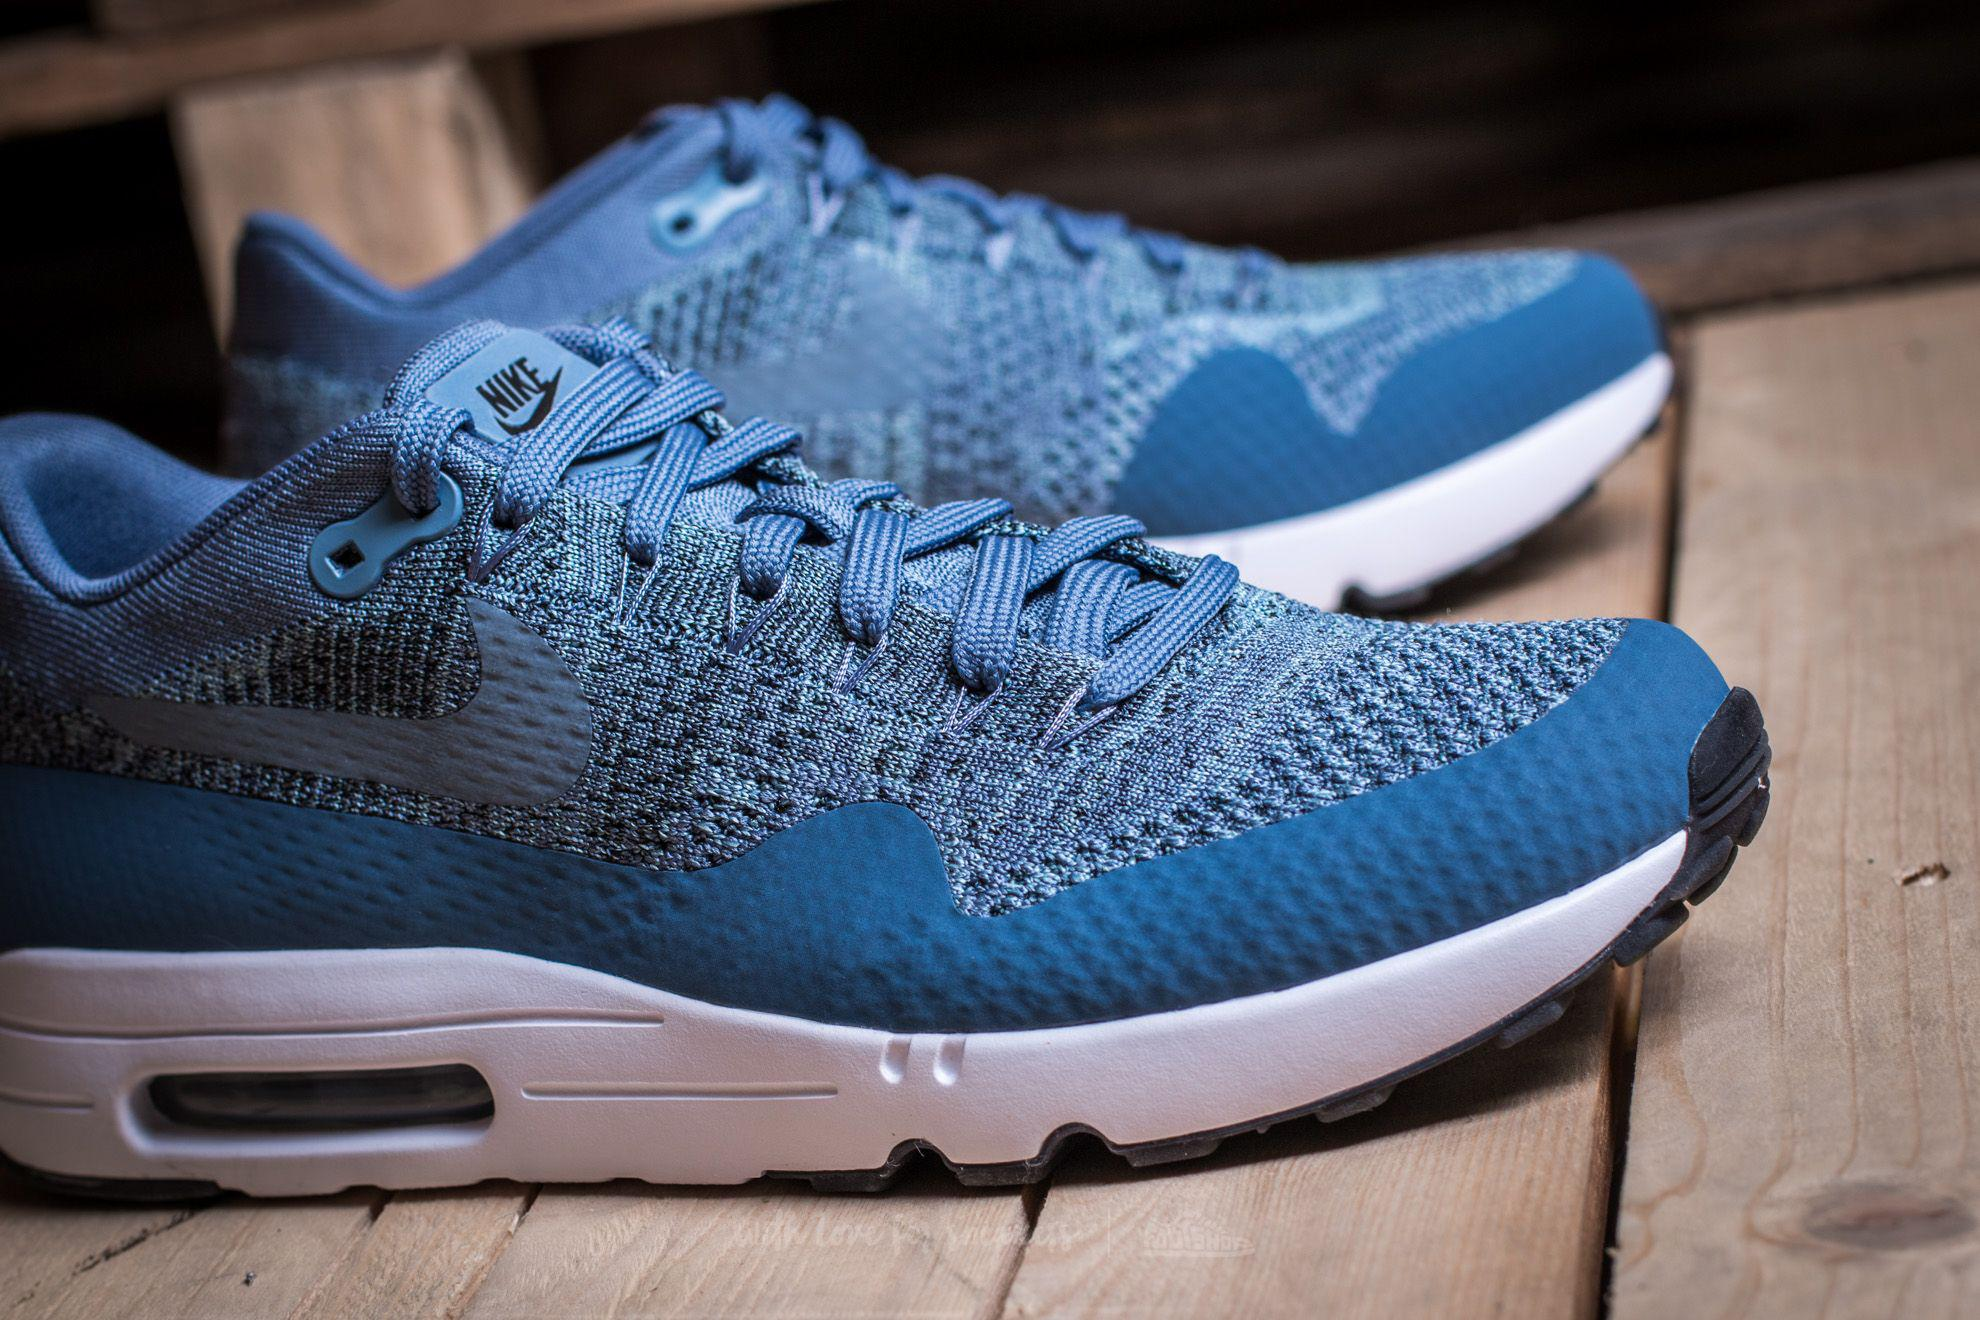 Nike Air Max 1 Ultra 2.0 Flyknit Ocean Fog Blue   SneakerFiles